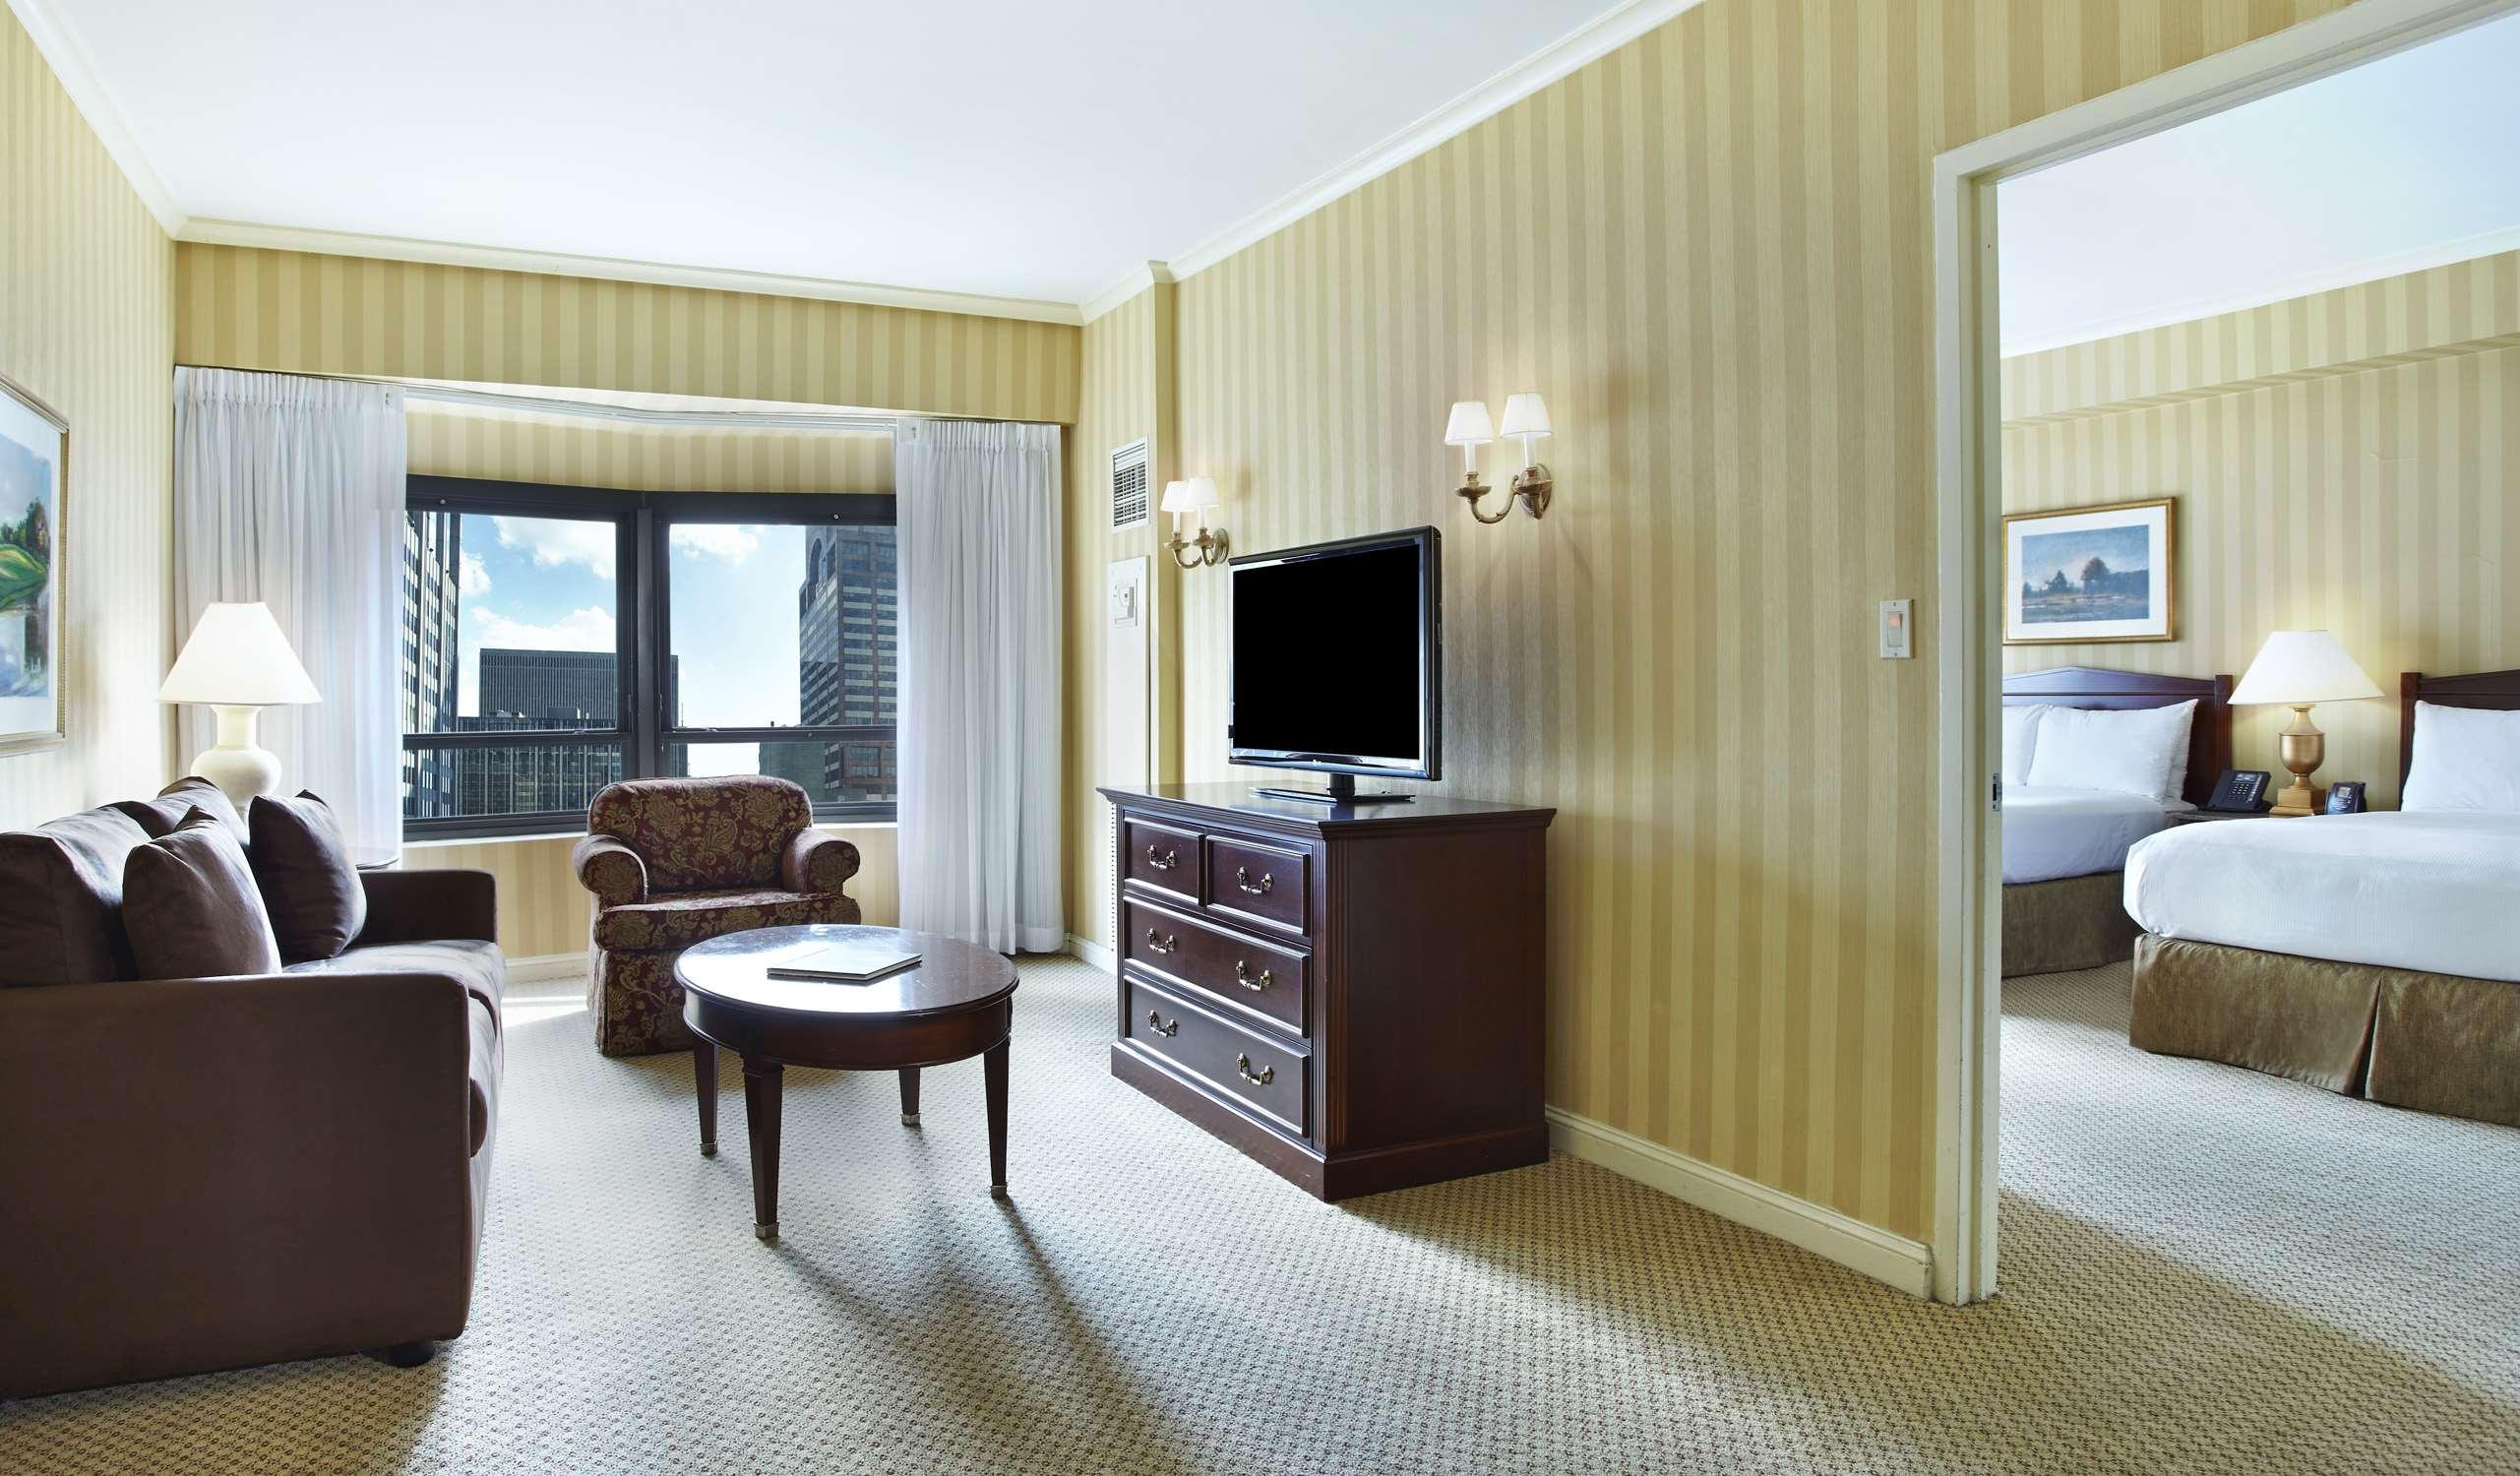 New York Hilton Midtown image 24